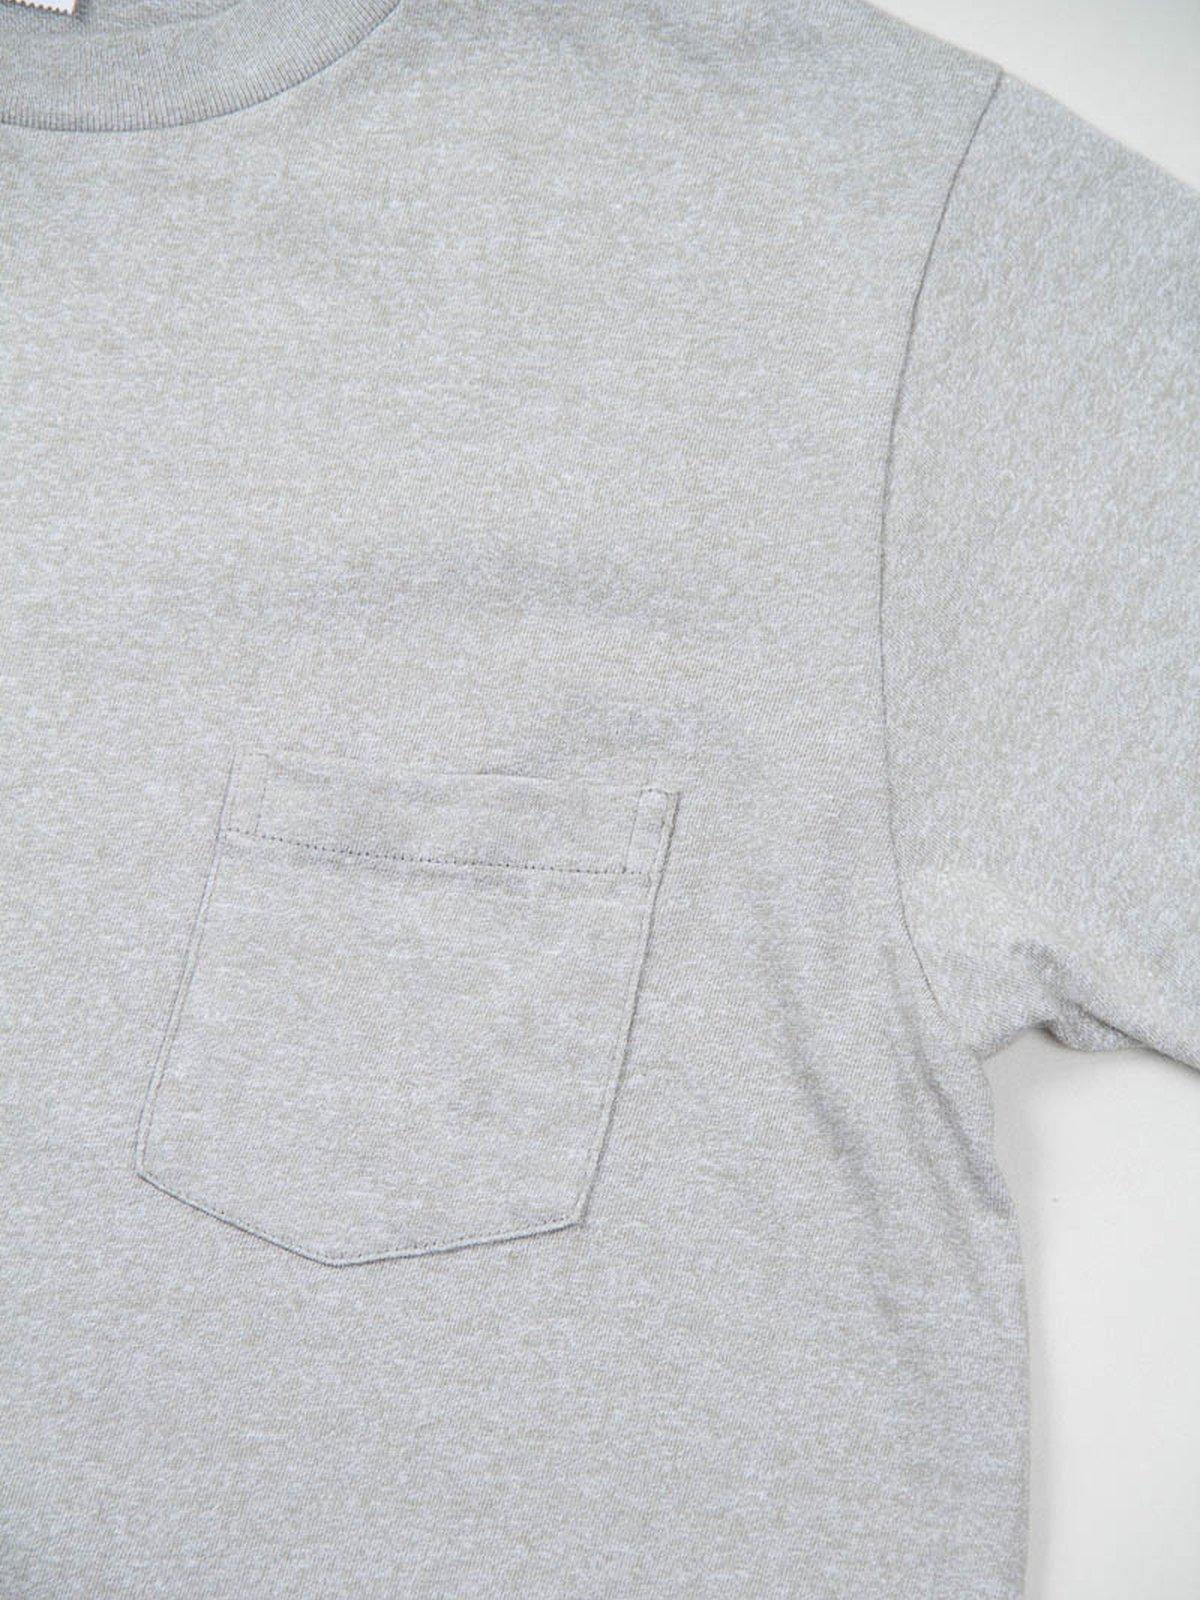 Heather Grey 1–Pac Pocket Tee - Image 4